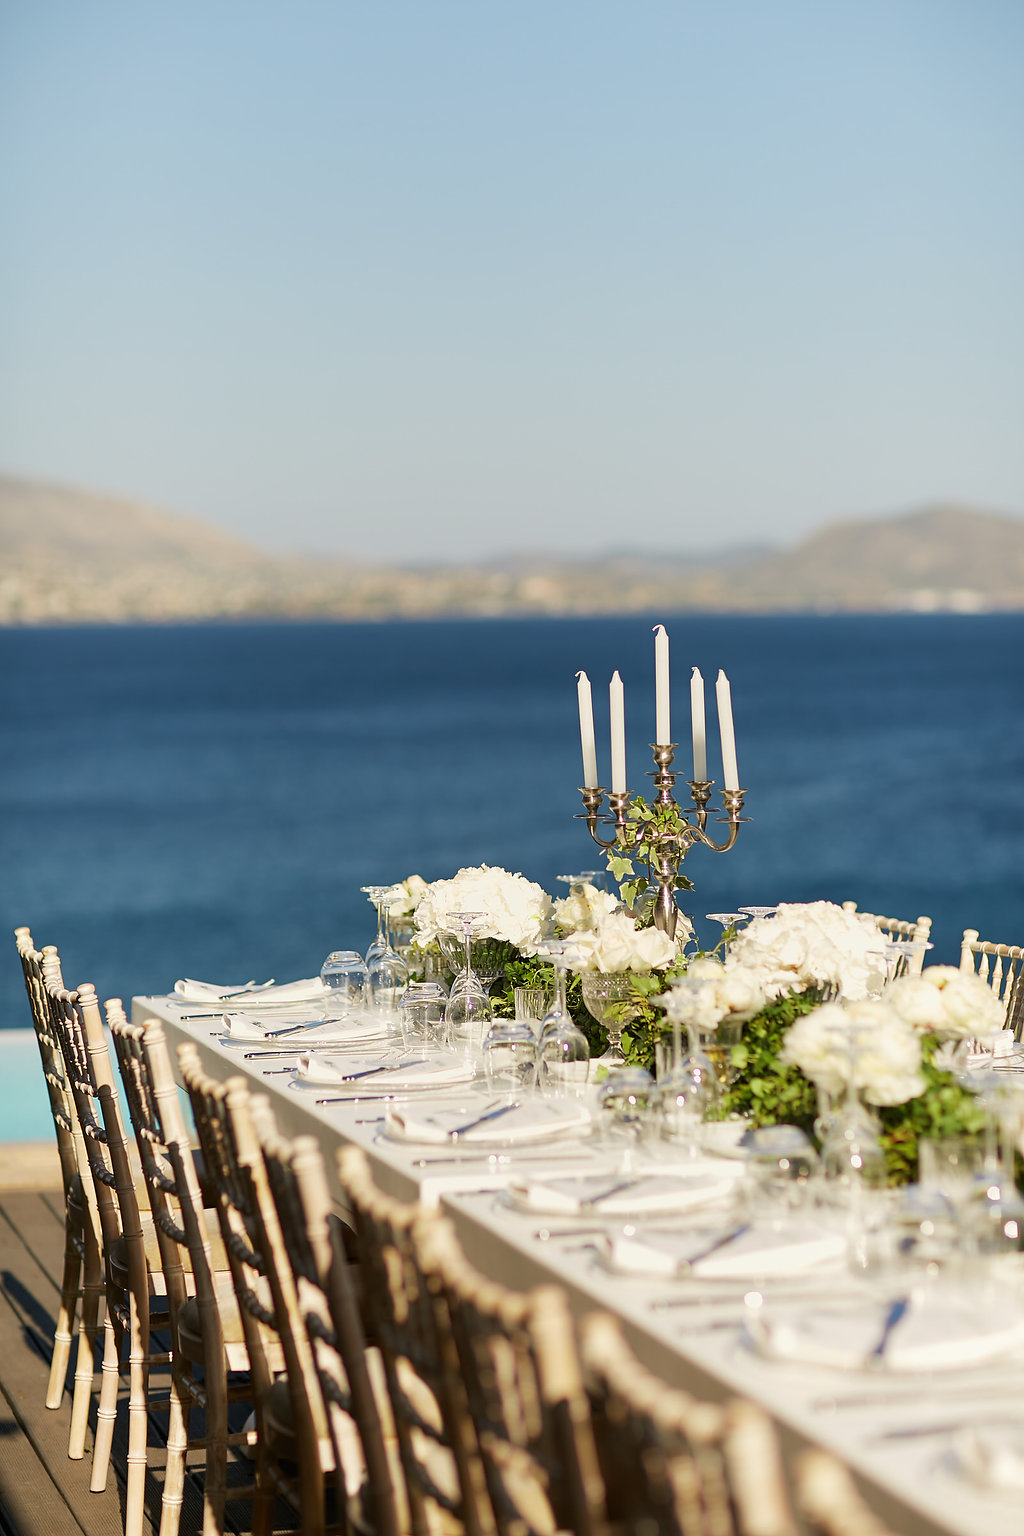 organic wedding inspiration in Greece - photo by Sotiris Tsakanikas https://ruffledblog.com/chic-sunset-wedding-on-the-athens-riviera